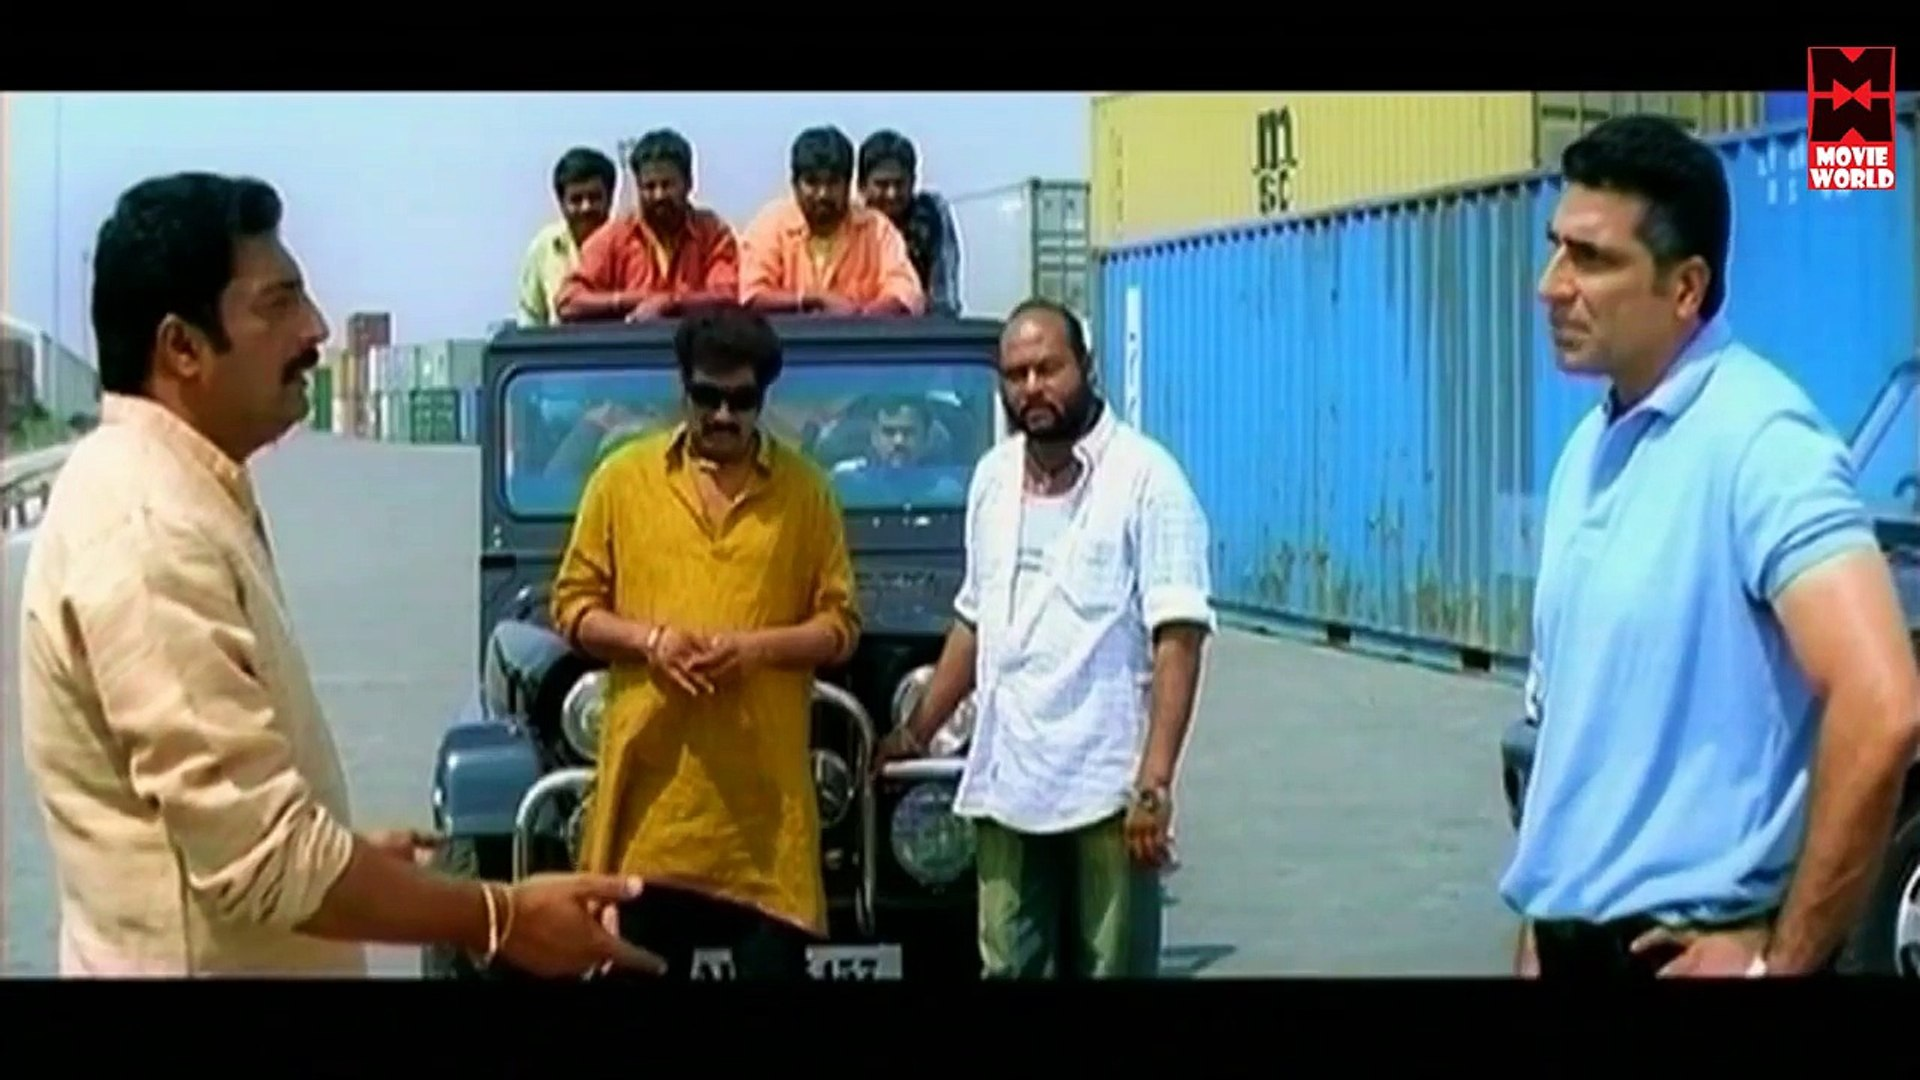 Oriya Movie Full || Dharma Yudh || Allu Arjun,Gowri Munjal || Odia Movie Full Mini Movie